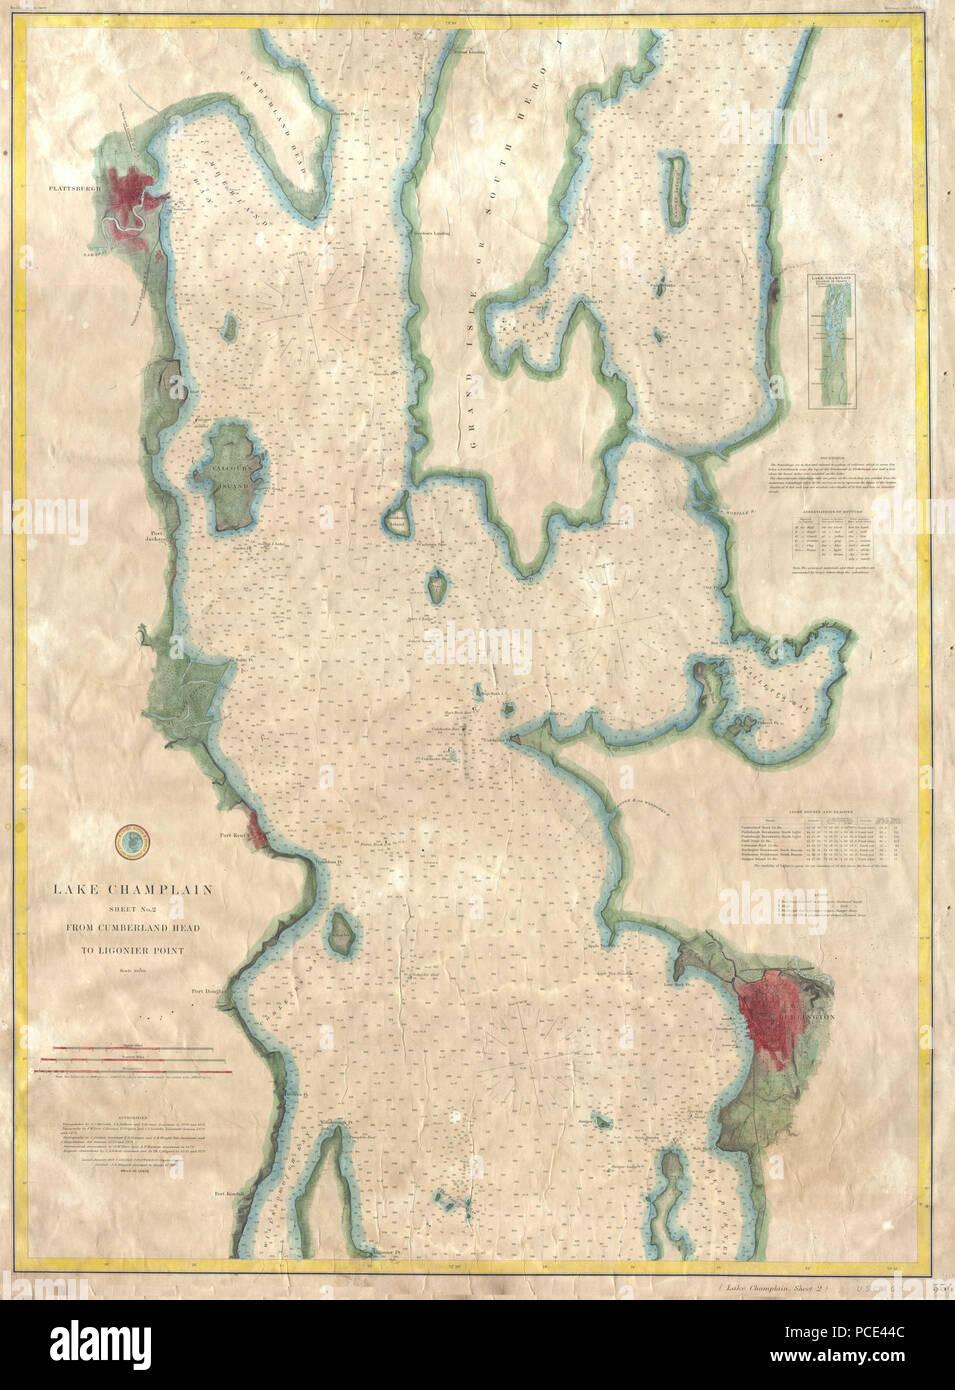 10 1874 Uscs Map Or Chart Of Lake Champlain Burlington Vt - Lake-champlain-on-us-map